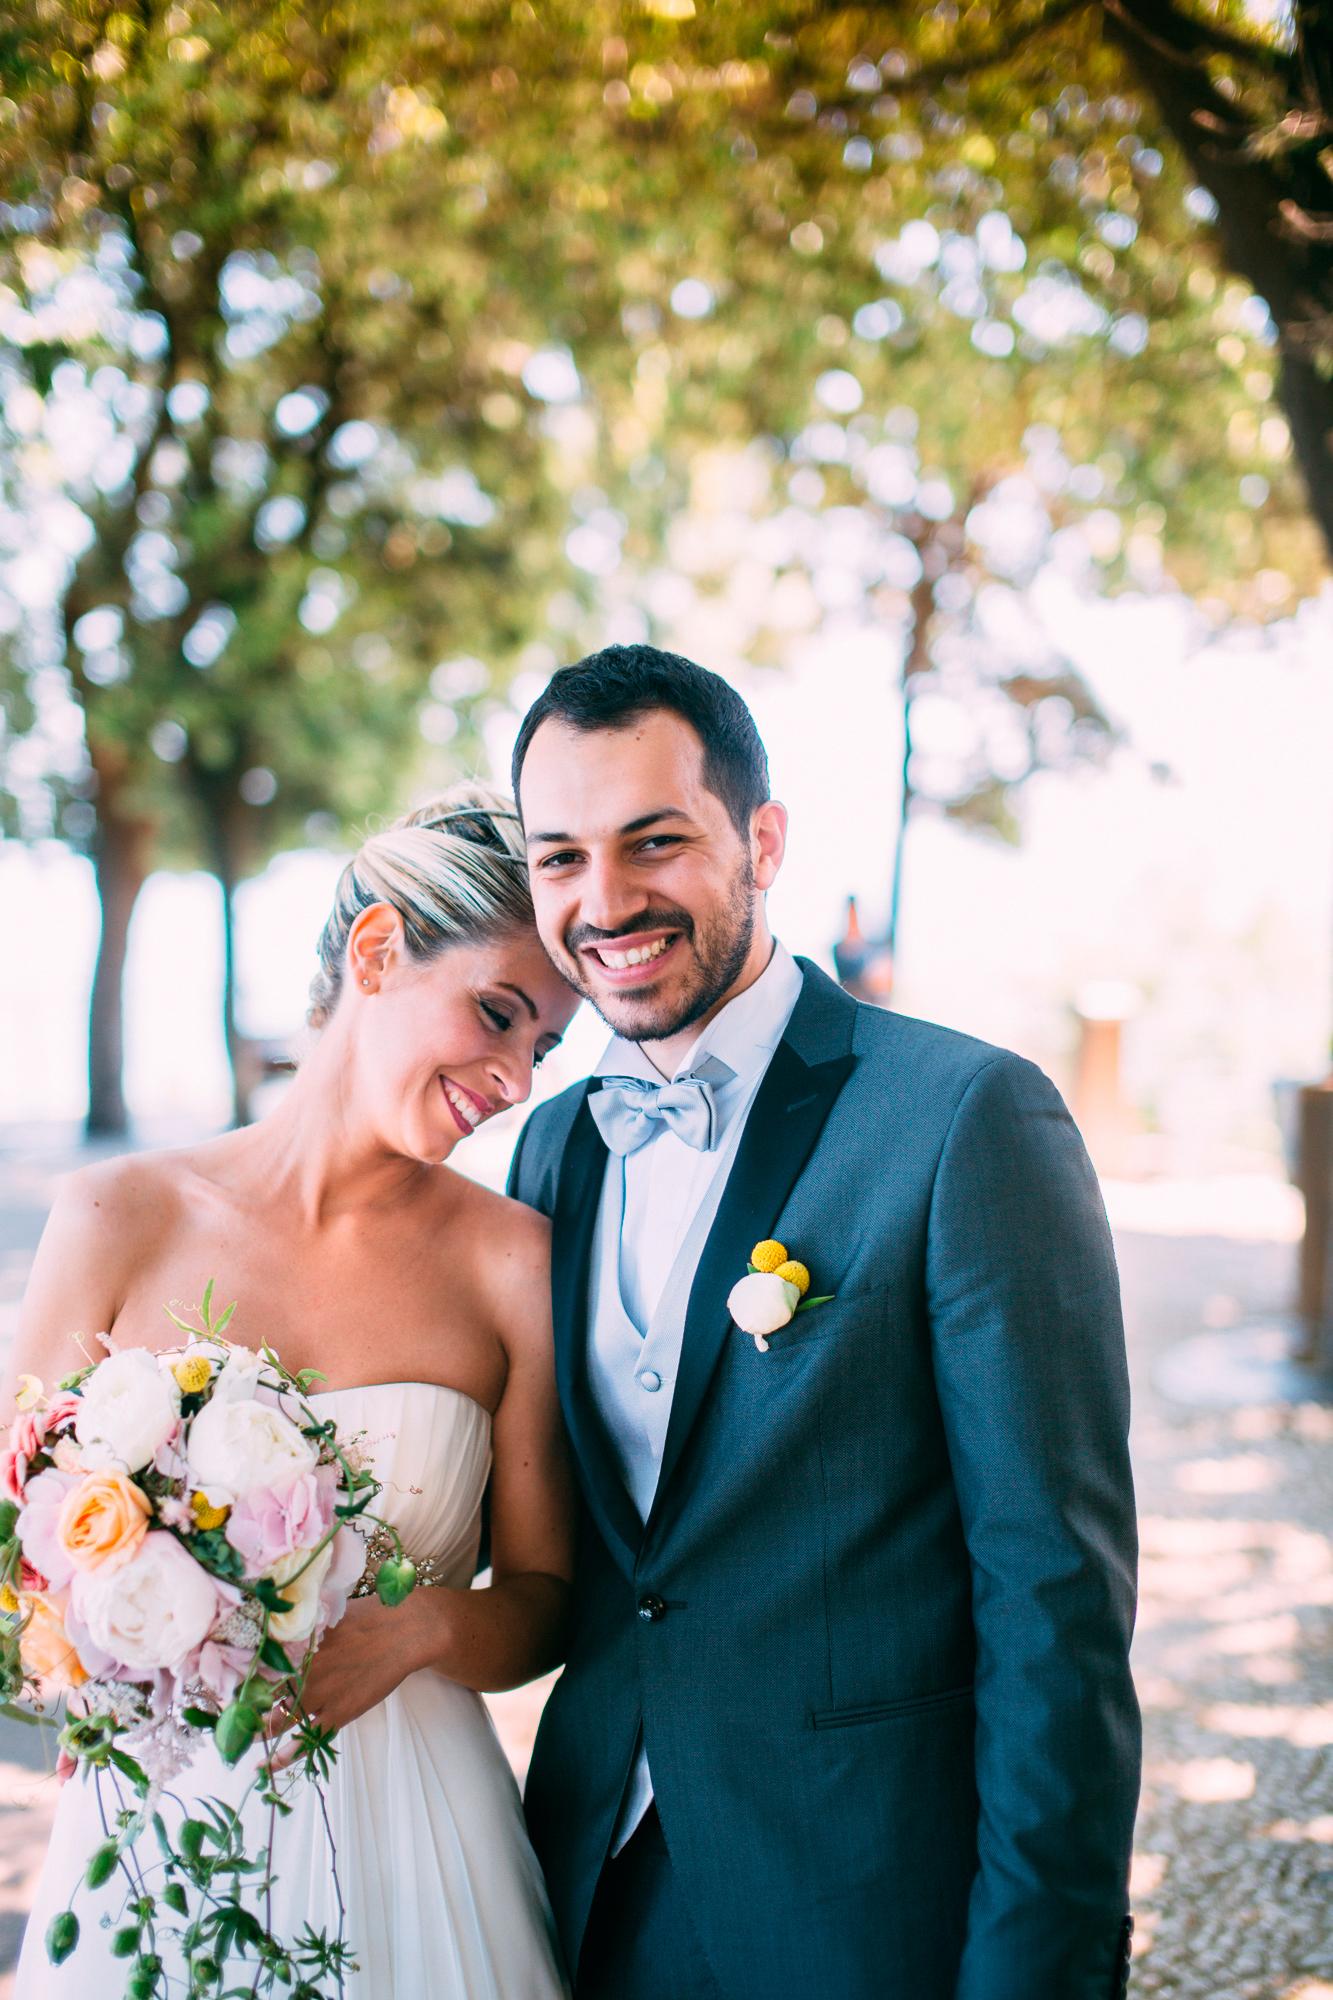 153-bride groom wedding portrait photographer marche conero.jpg